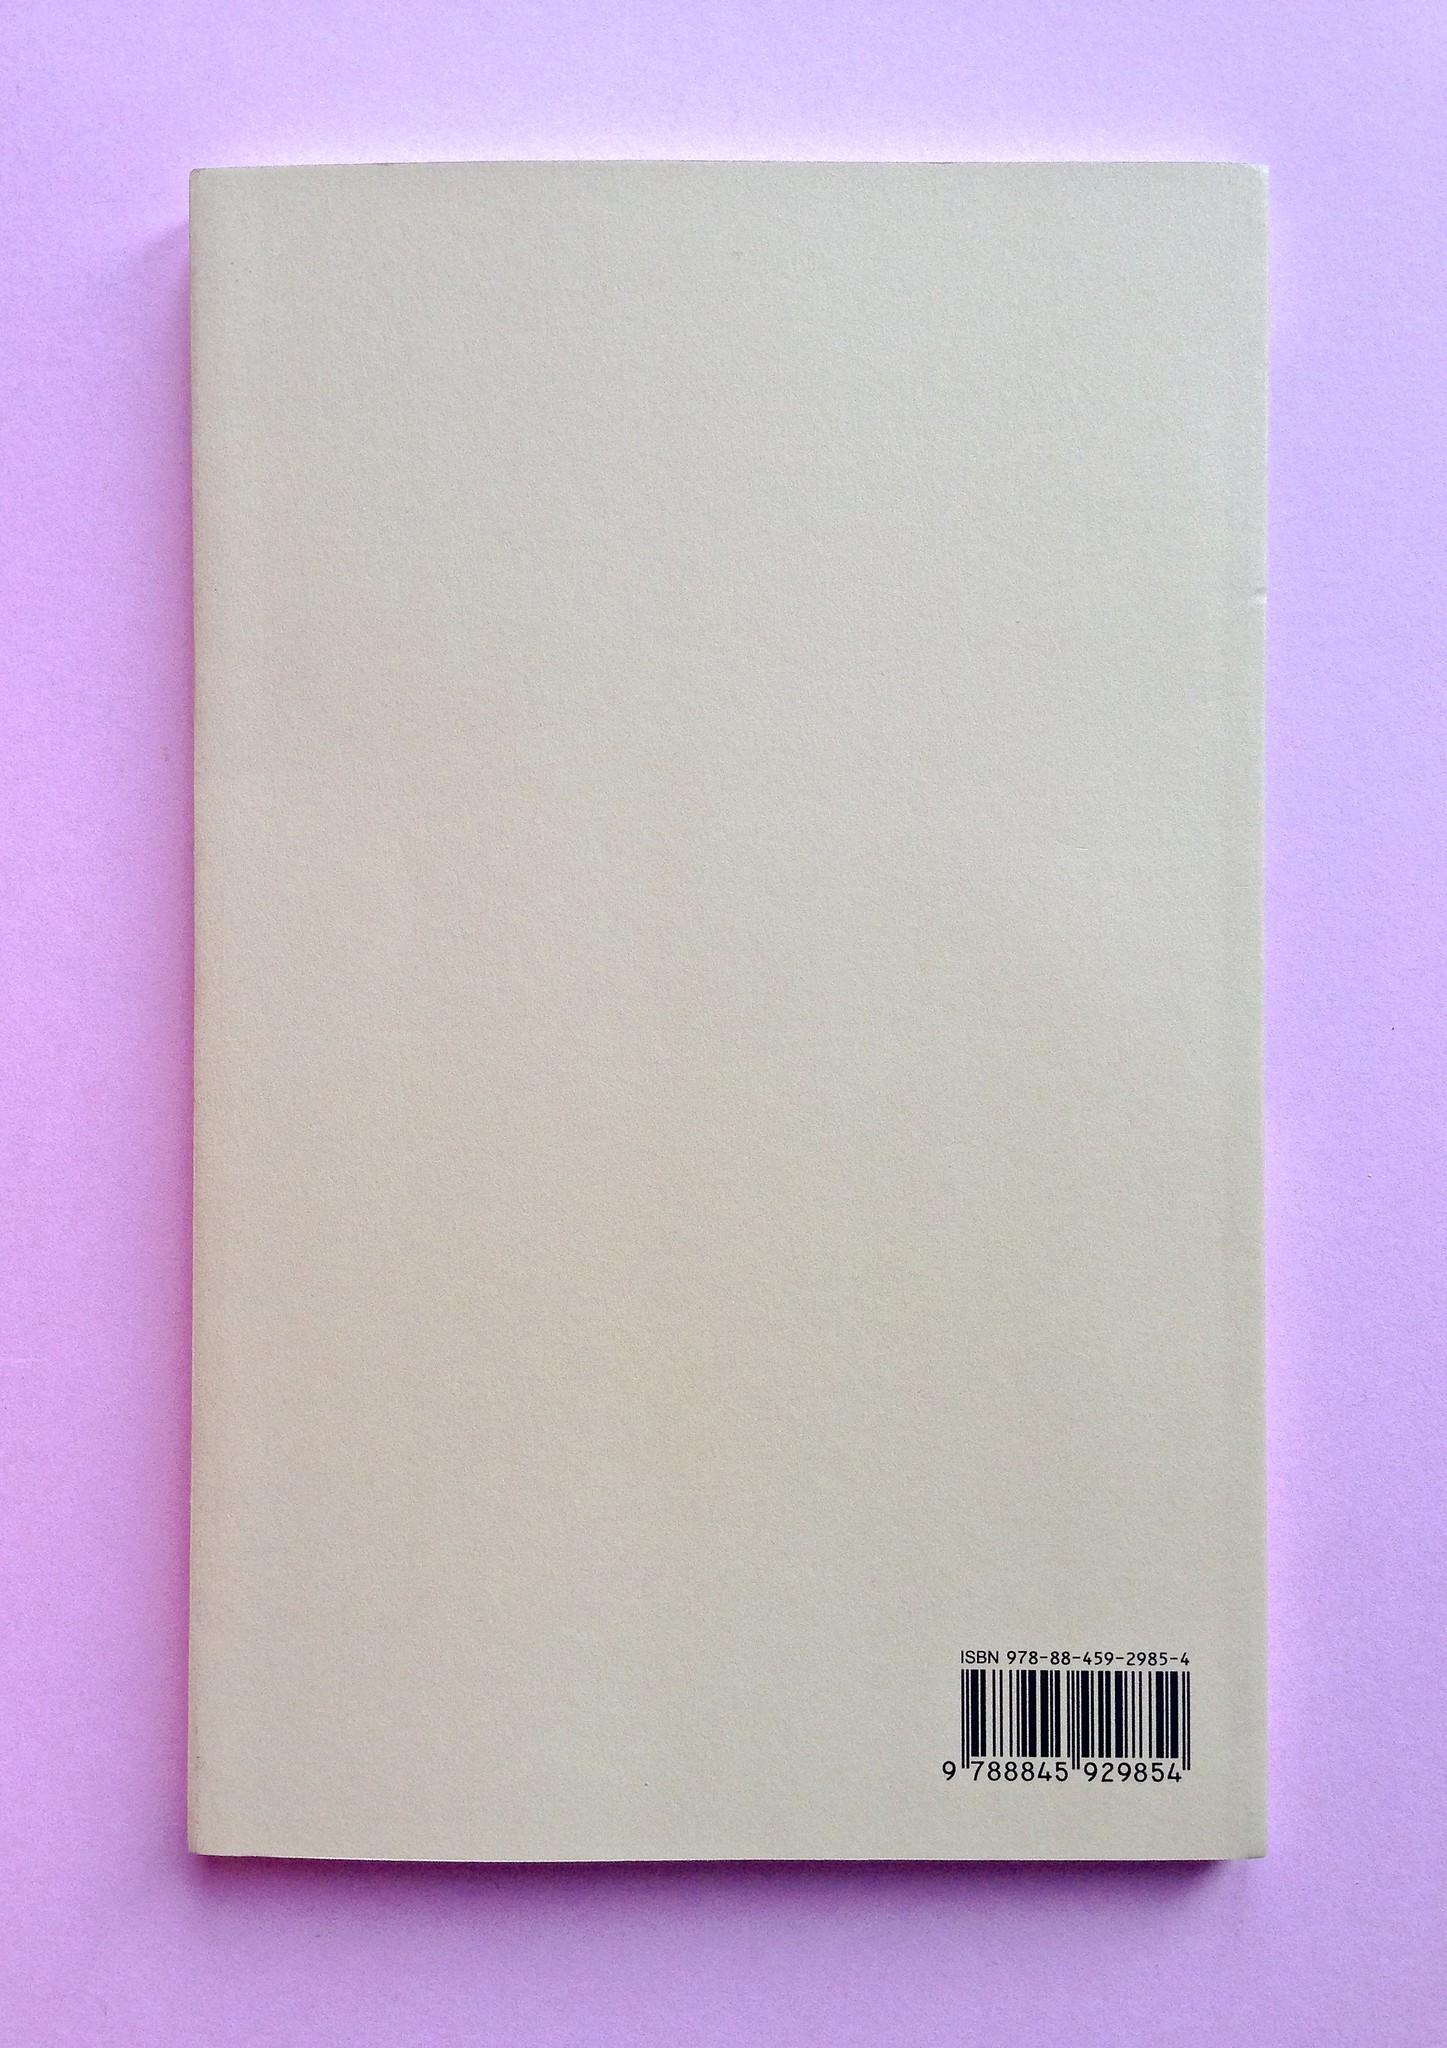 Proust a Grjazovec, di Józef Czapski. Adelphi 2015. Resp. grafica non indicata. Quarta di copertina (part.), 1